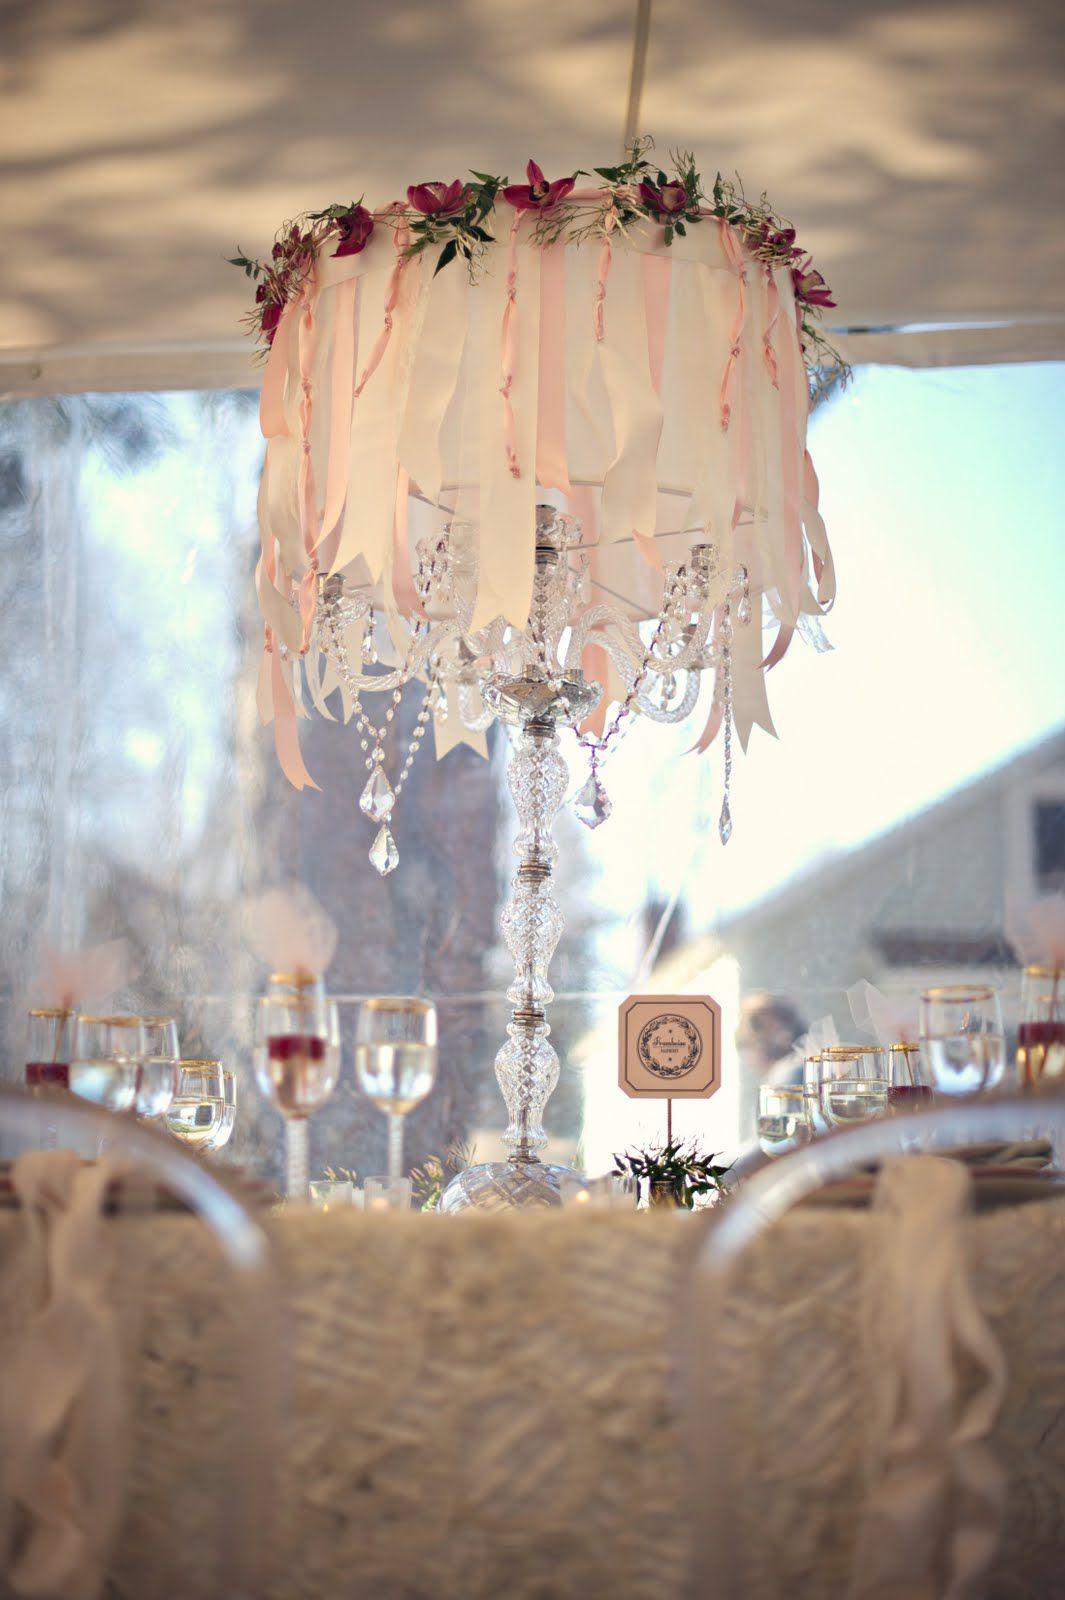 we ❤ this!  moncheribridals.com  #weddingtablescape #weddinghangingdecor